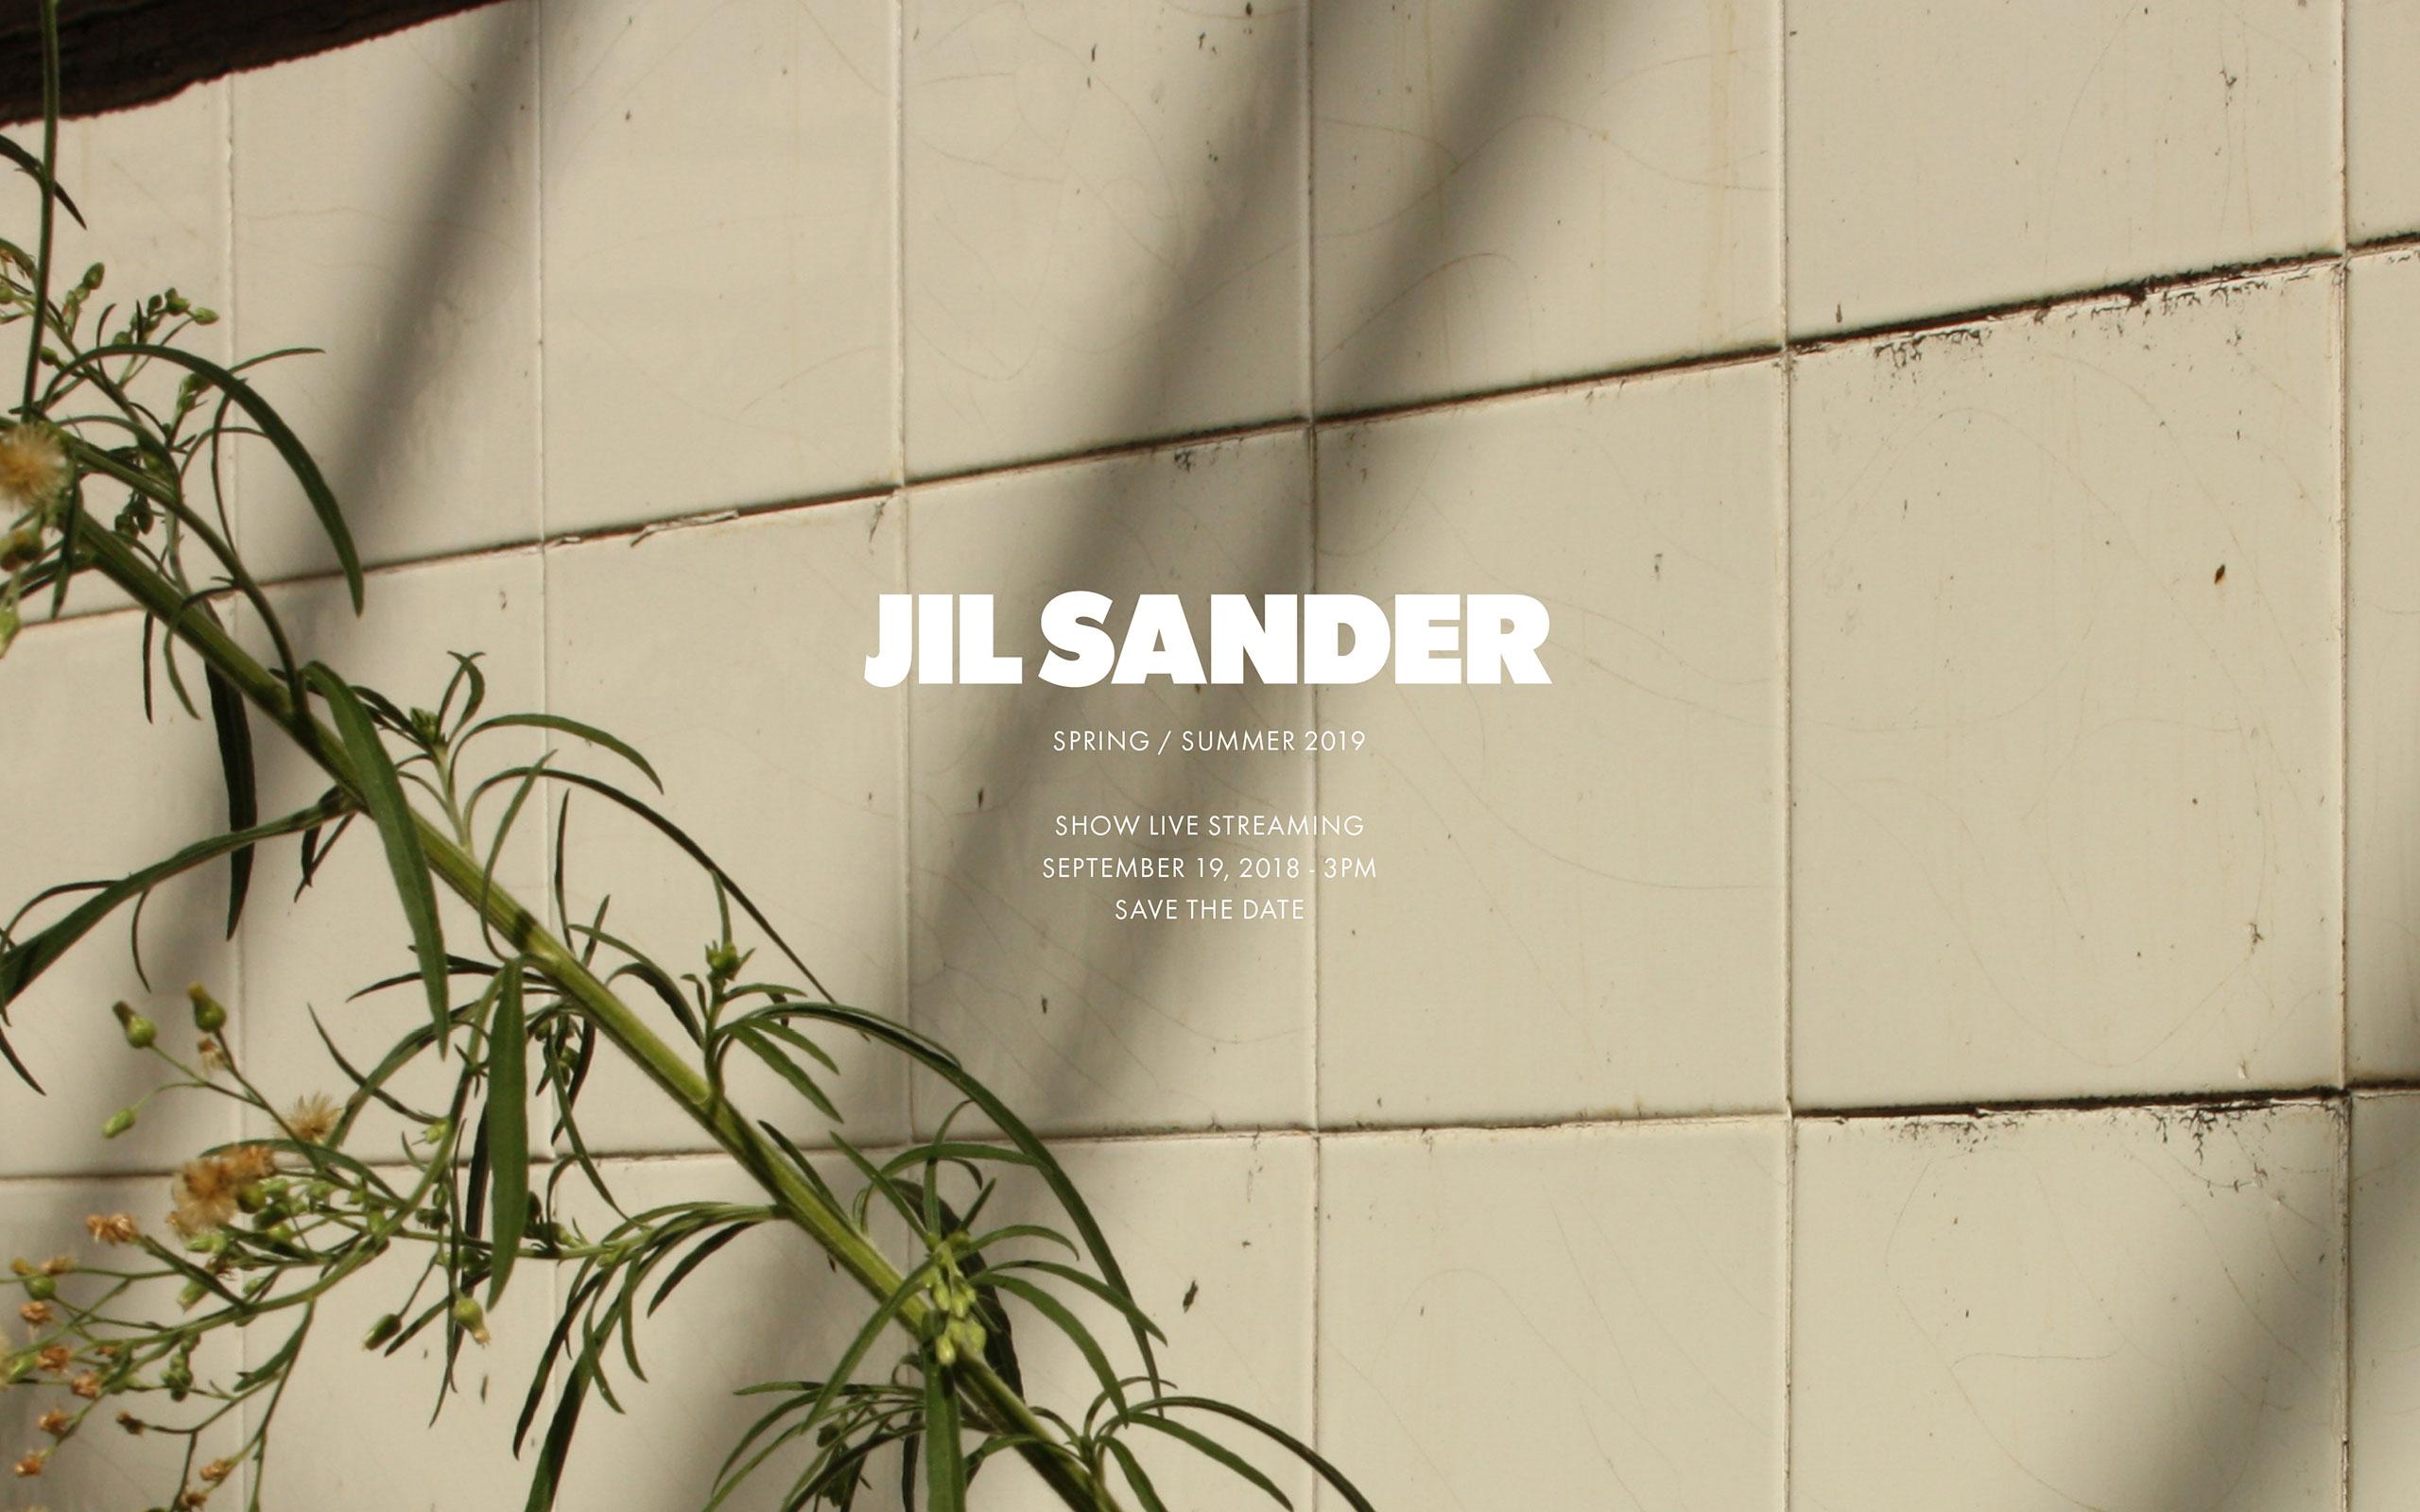 Now On Live: Jil Sander's Spring Summer 2019 Collection